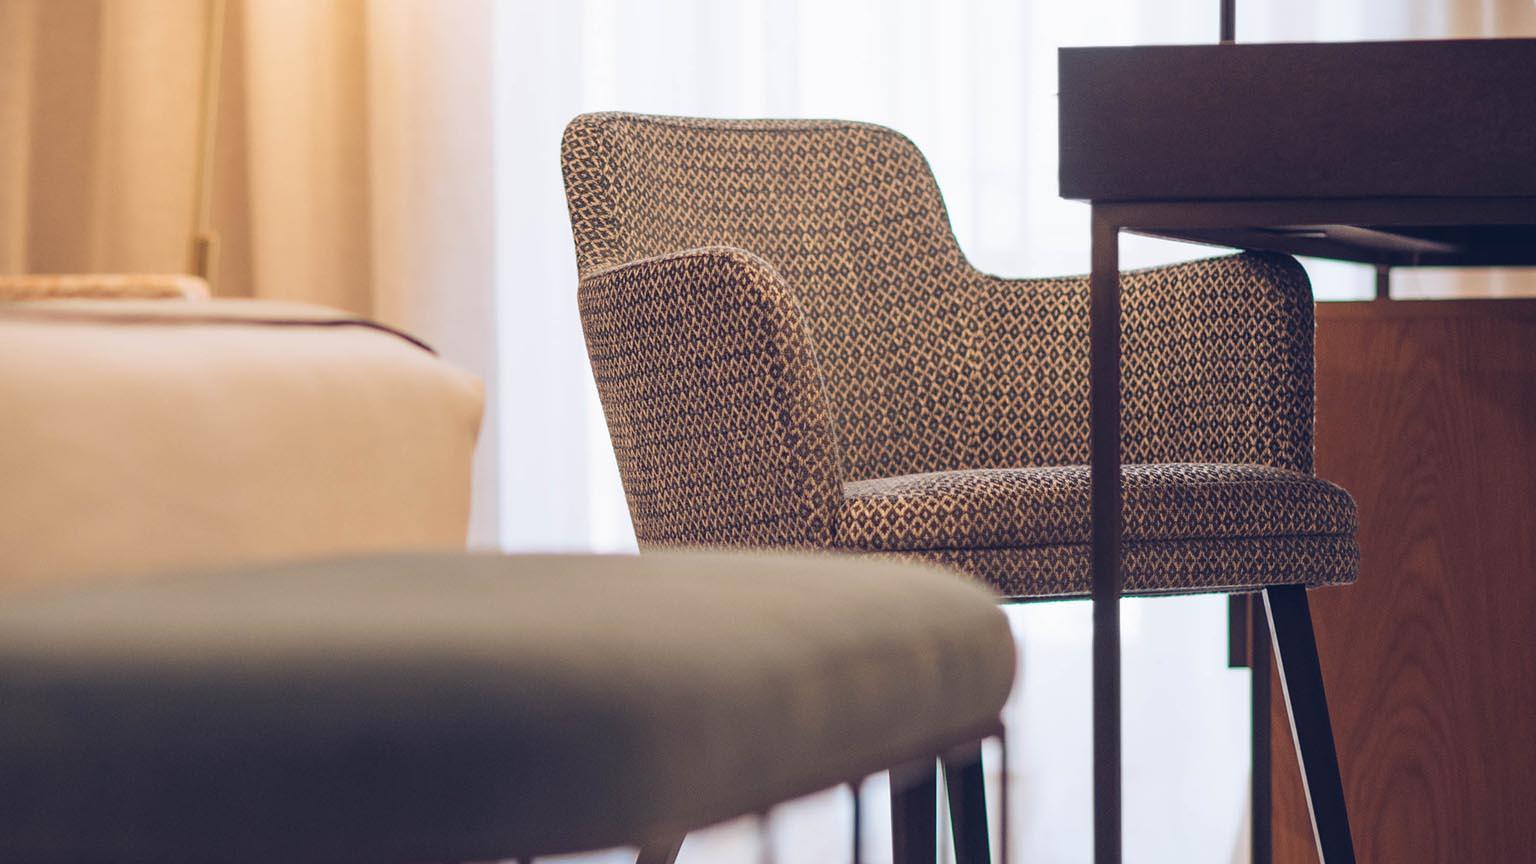 Superior Luxury Room Chair